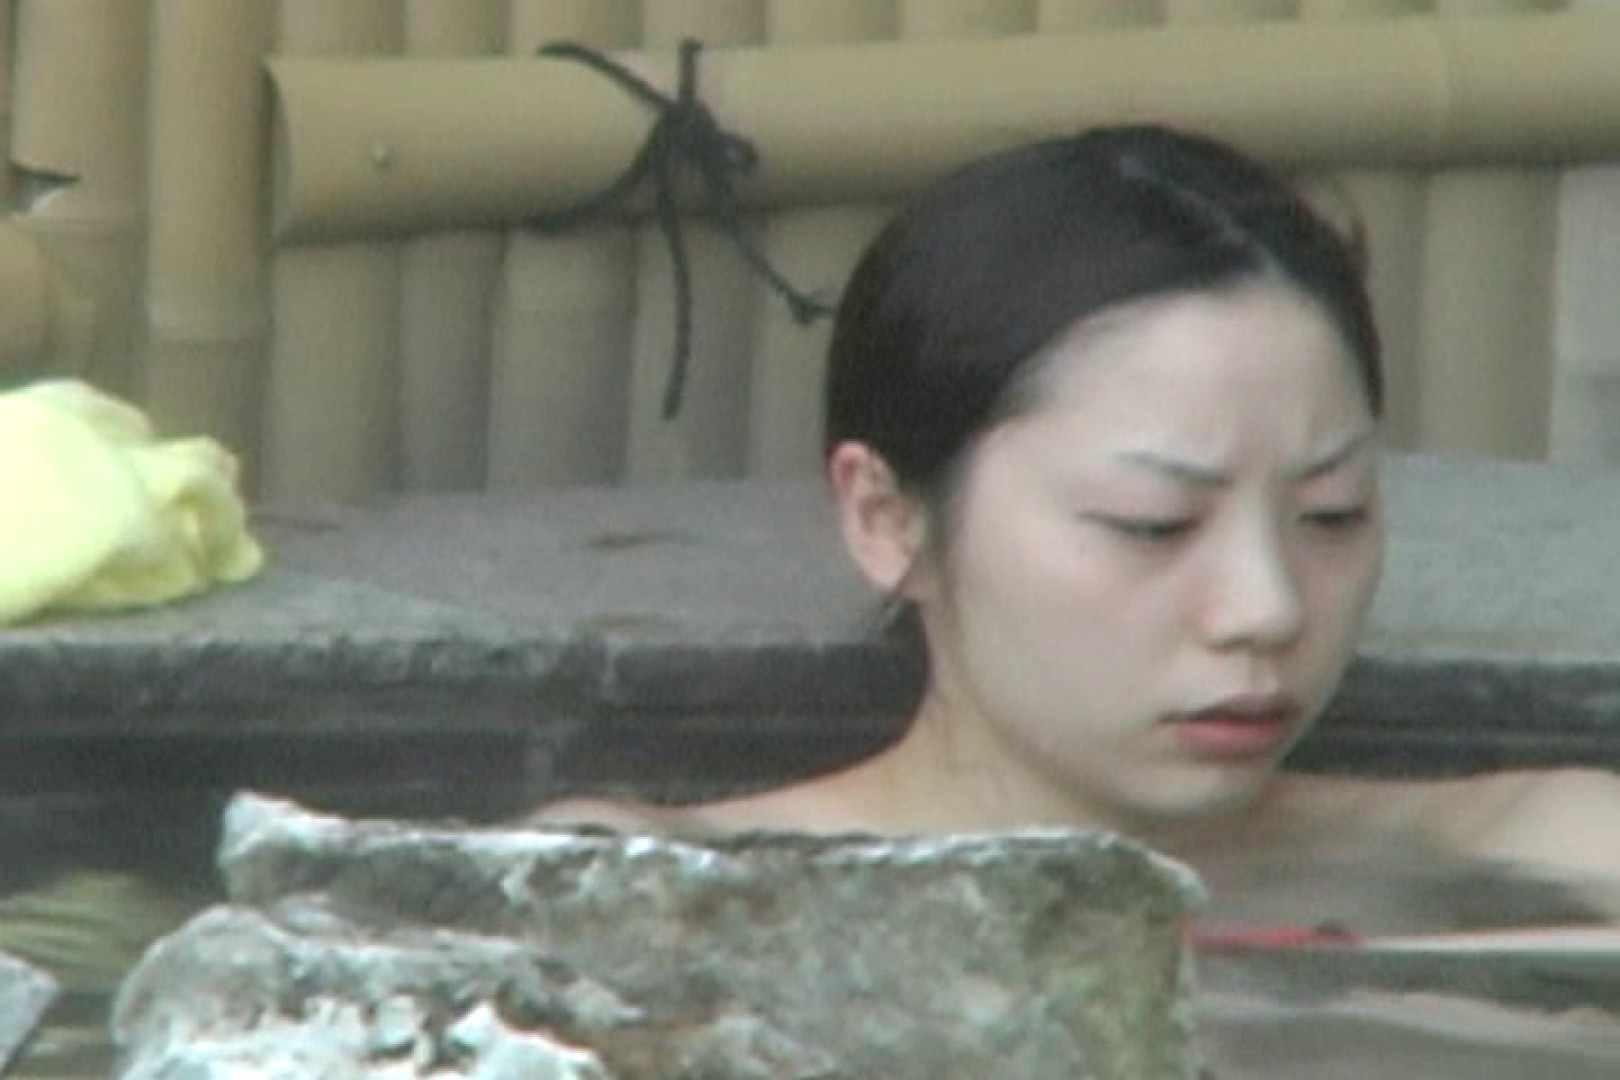 Aquaな露天風呂Vol.596 盗撮シリーズ | 露天風呂編  113PIX 31